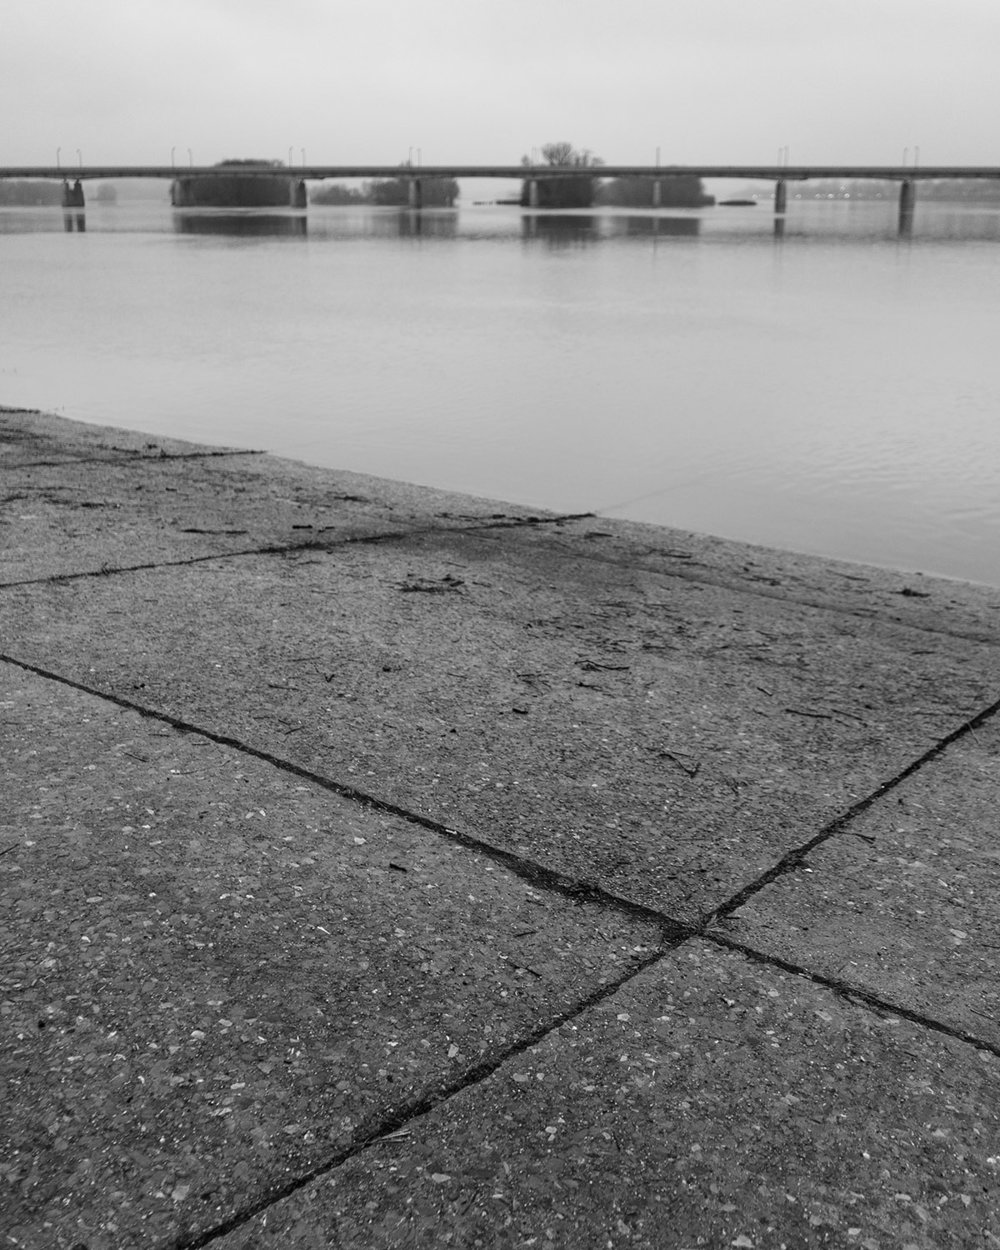 Susquehanna River - Harrisburg, Pennsylvania - fine art photography